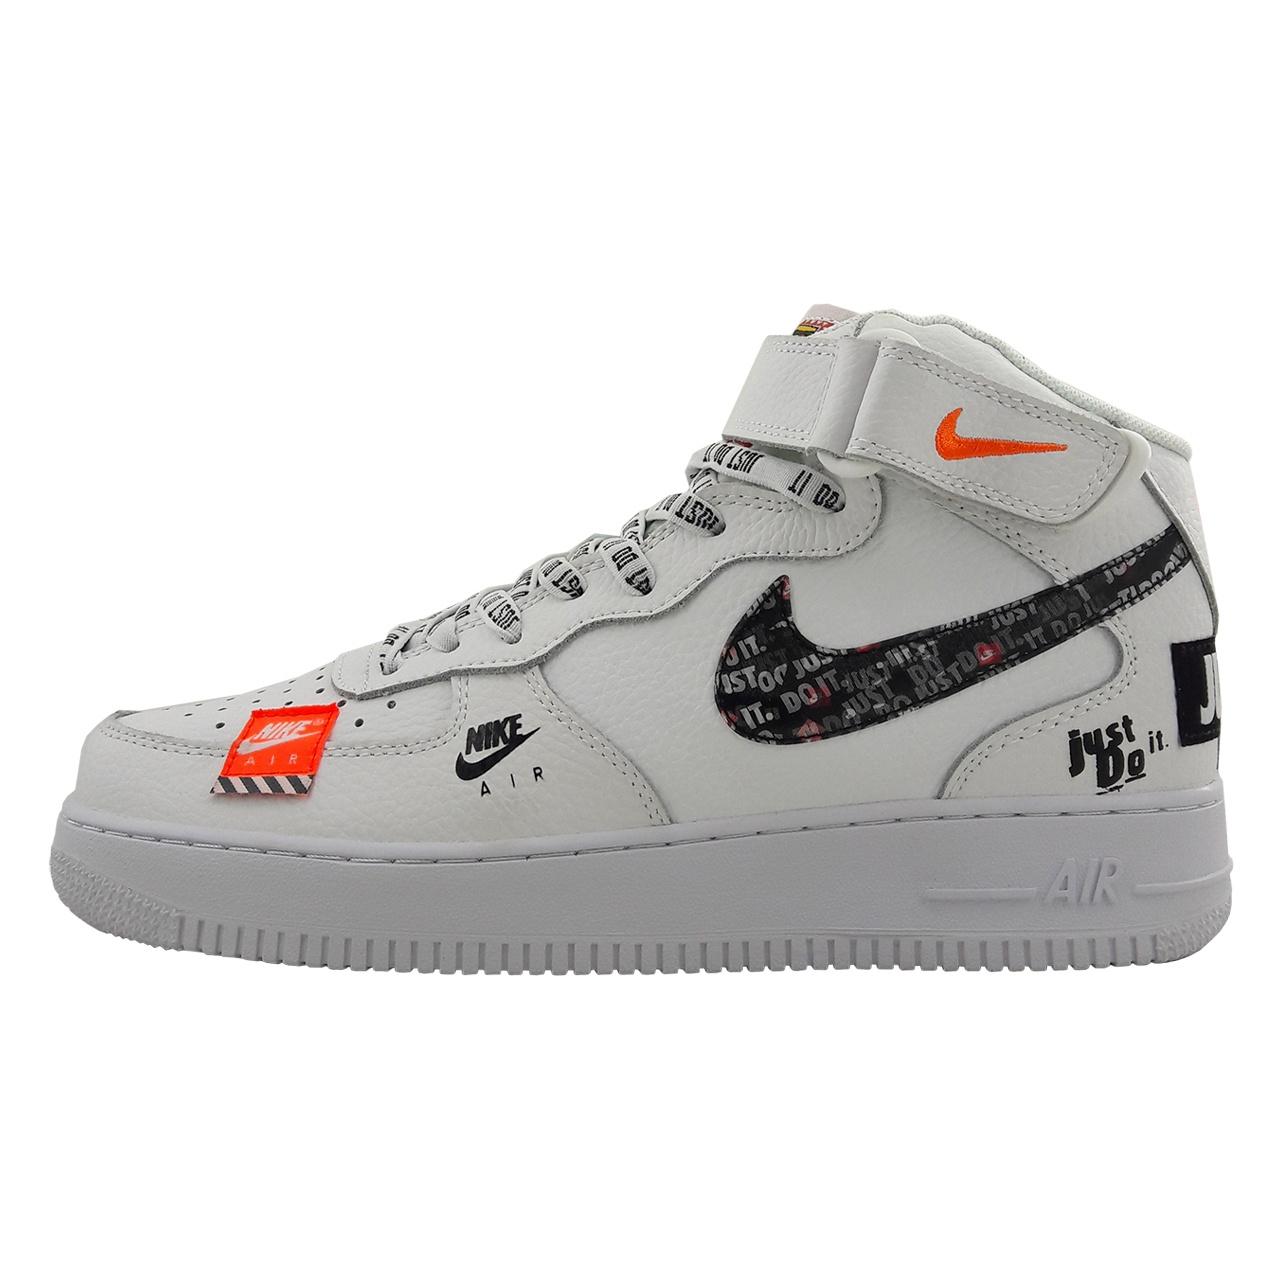 کفش راحتی مردانه نایکی مدل Air force 1 mid just do it